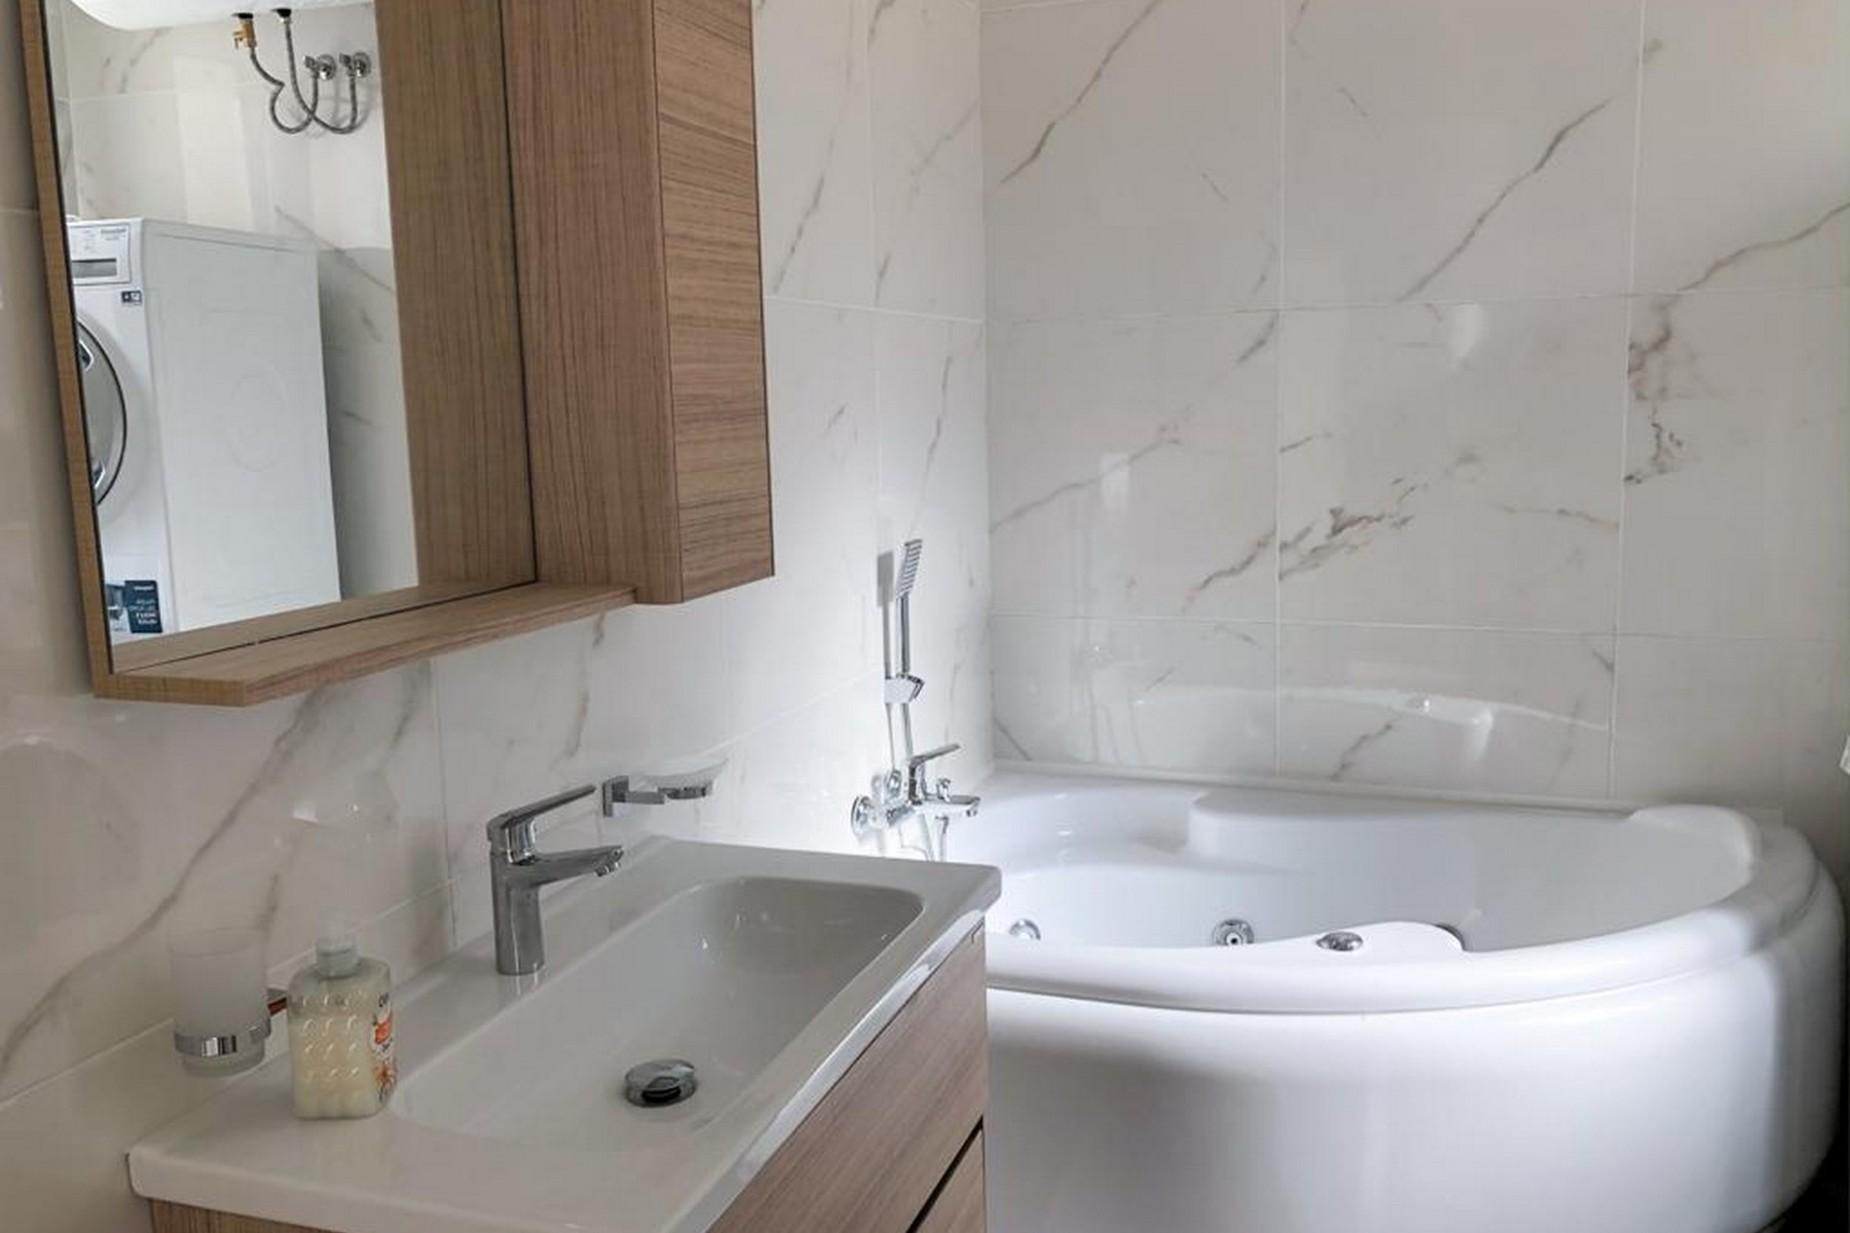 3 bed Apartment For Rent in Sliema, Sliema - thumb 10